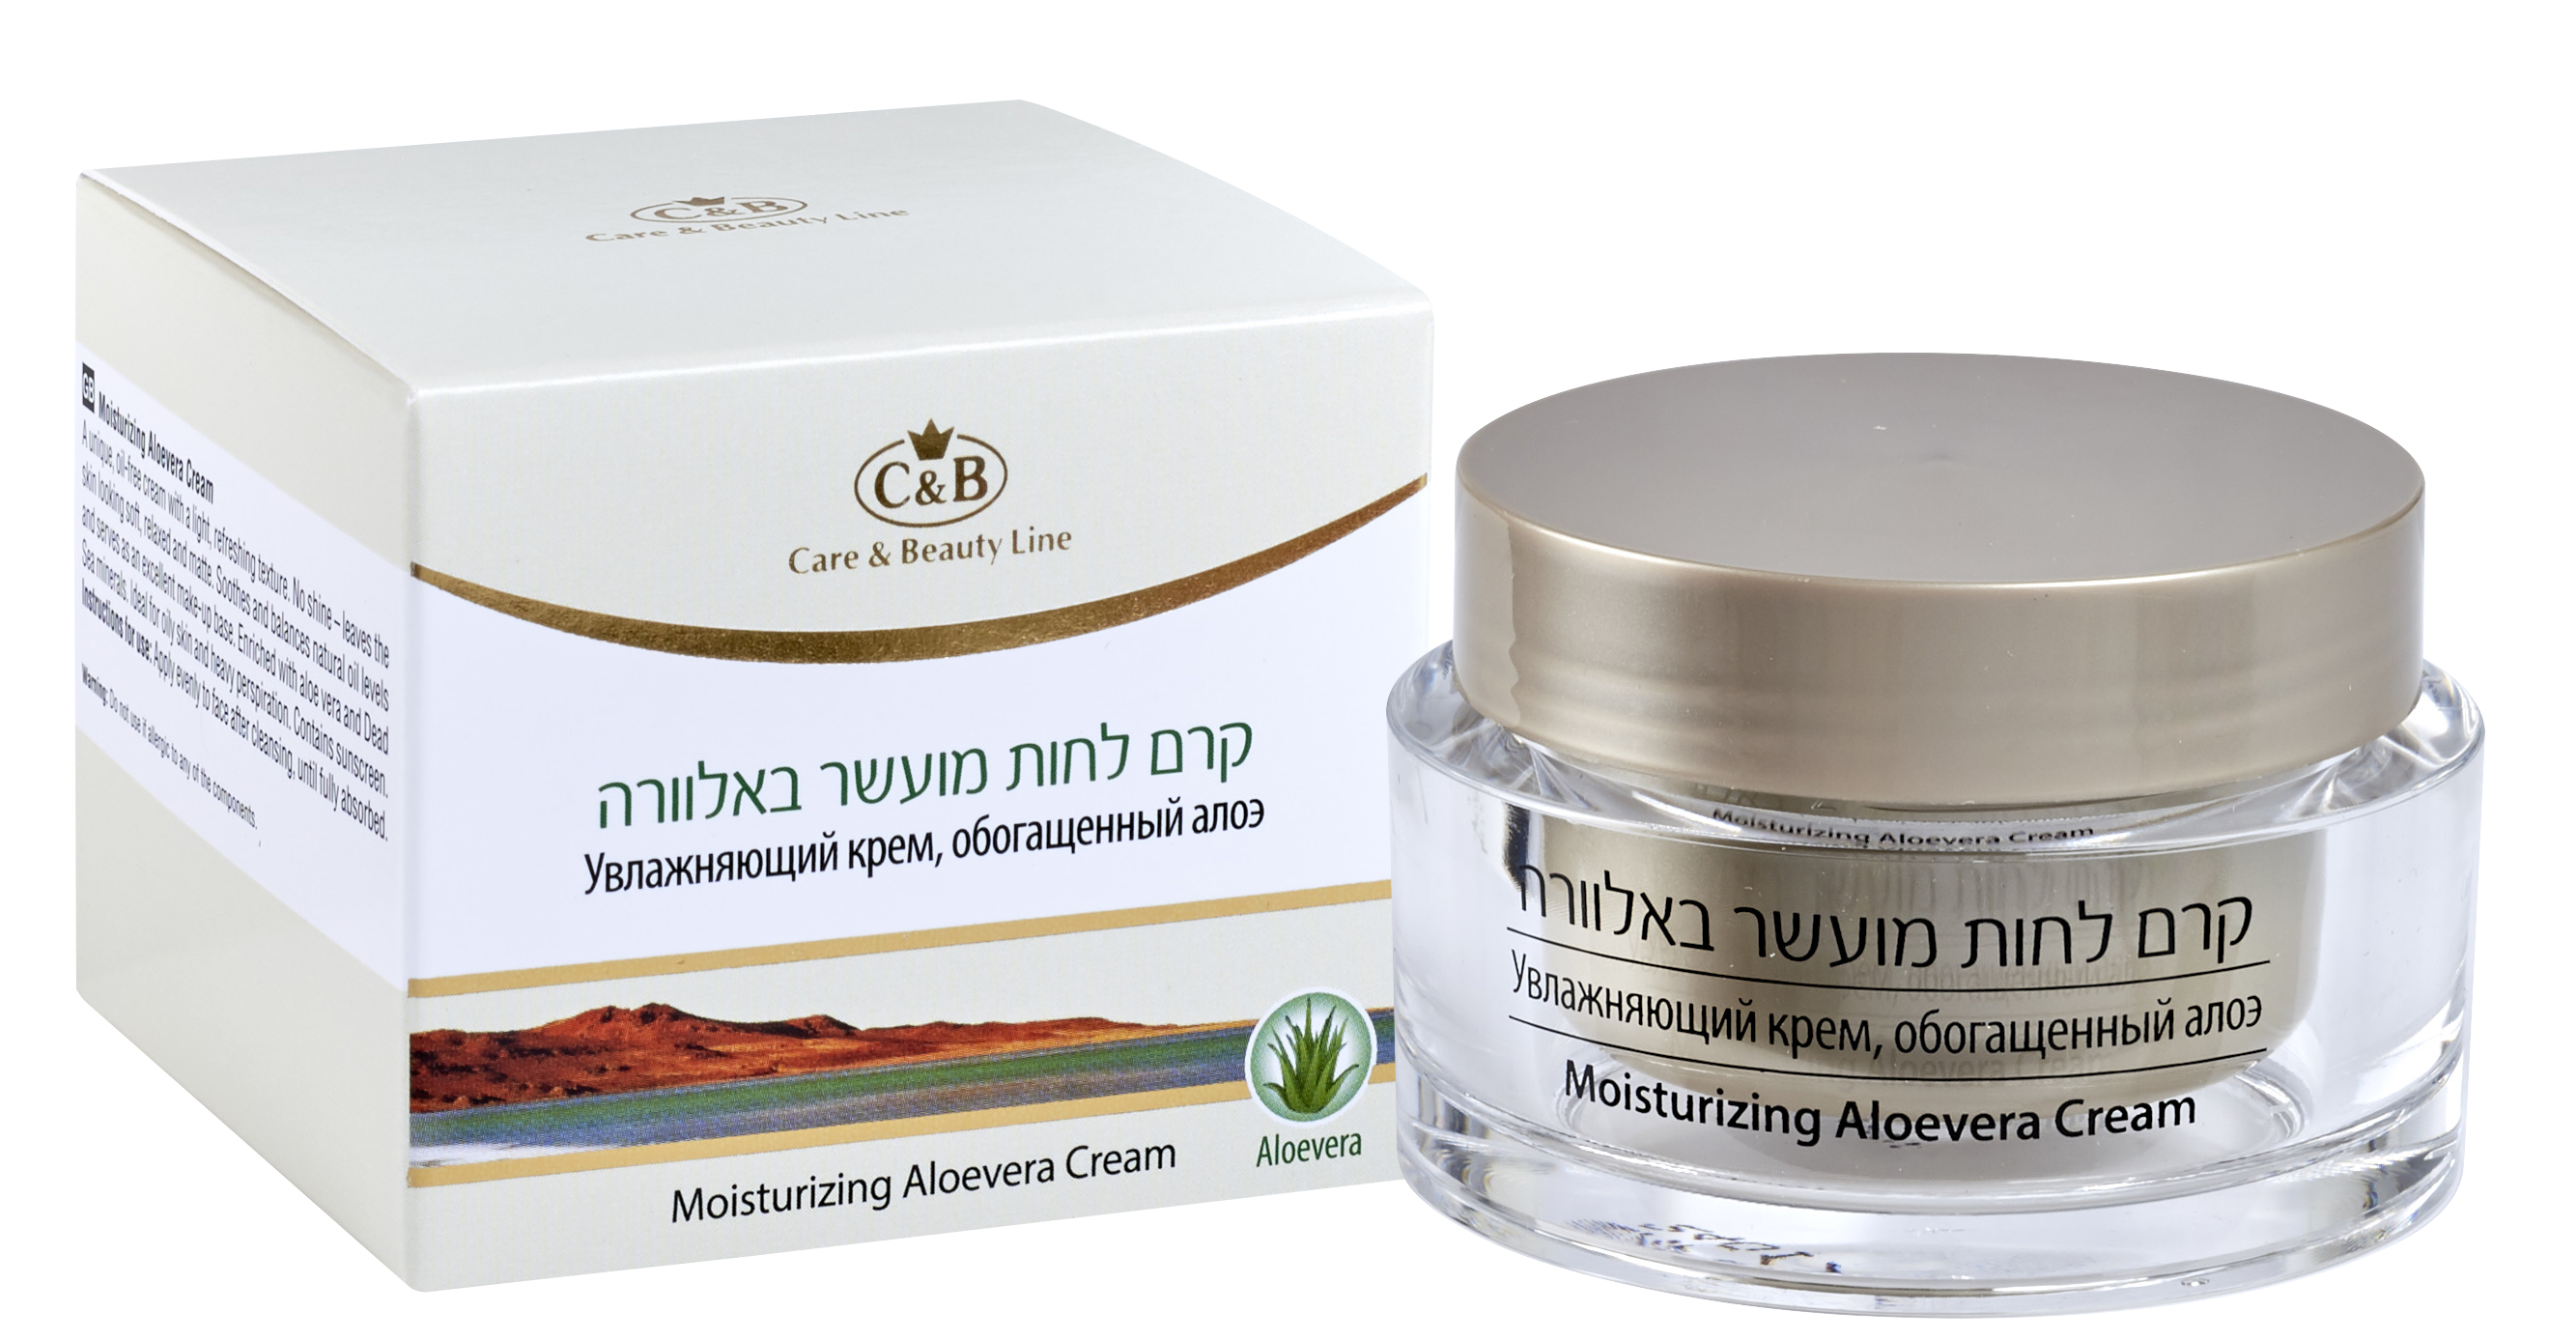 Увлажняющий крем с алоэ вера 50мл ТМ Care& Beauty Line Care& Beauty Line